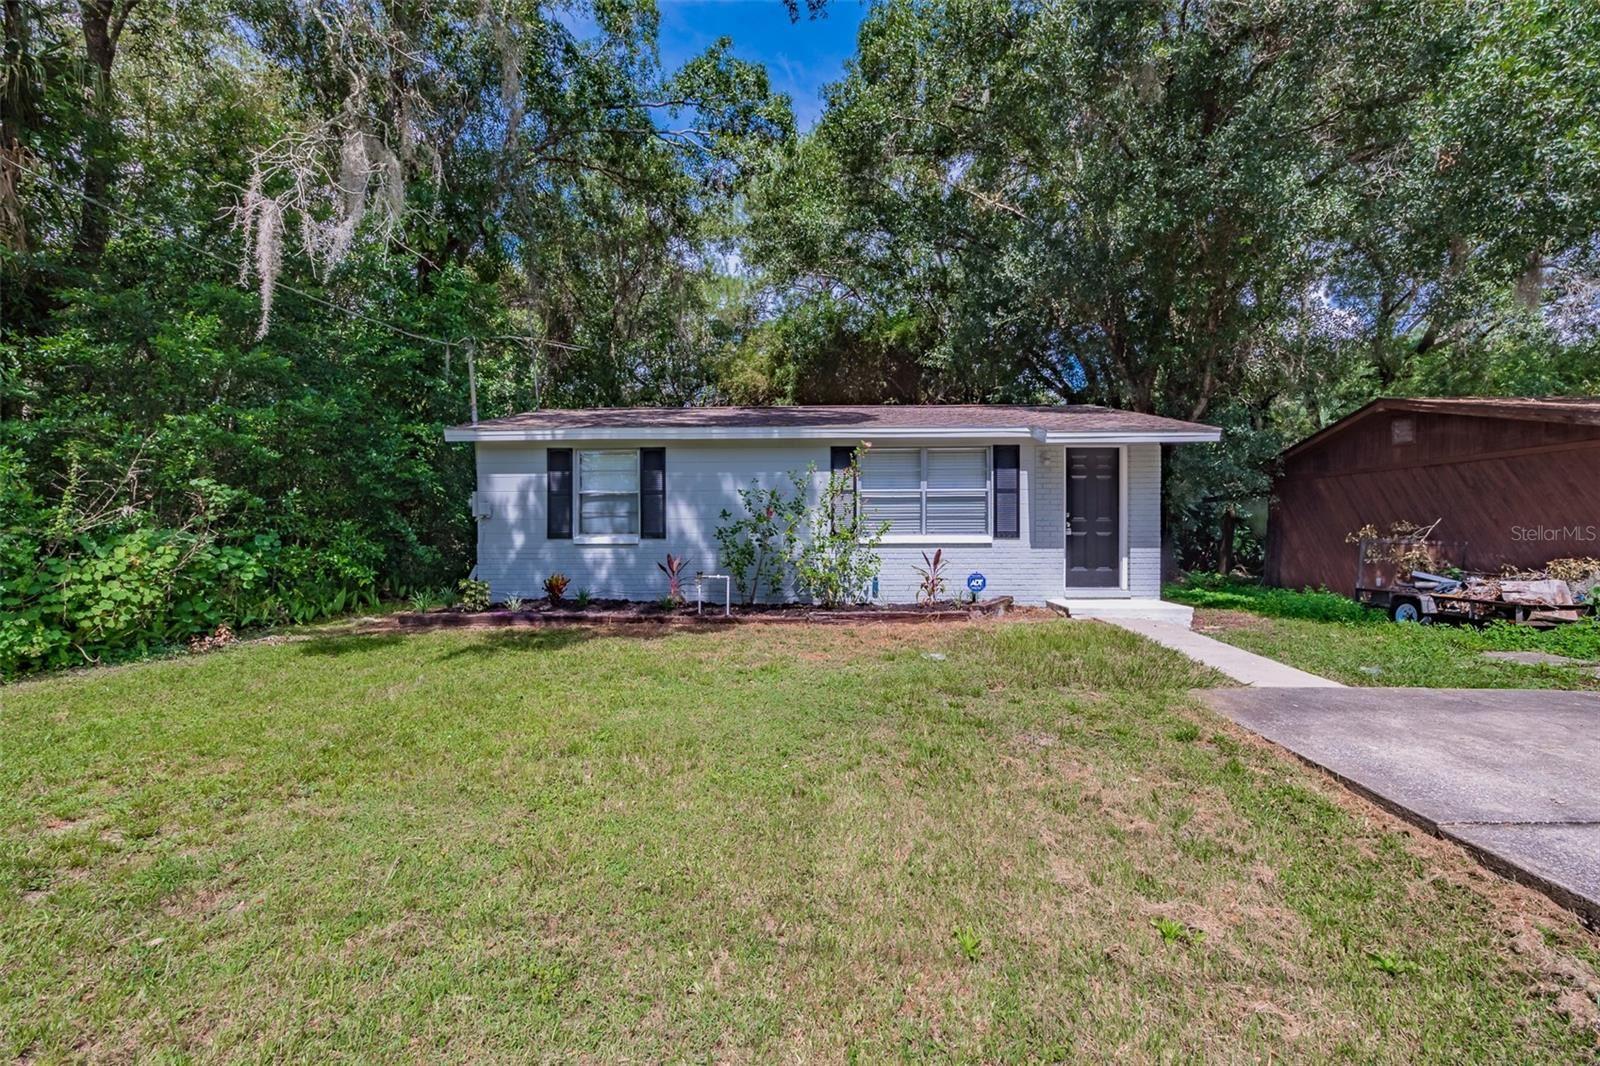 14804 DEL VALLE ROAD, Tampa, FL 33625 - #: T3317992